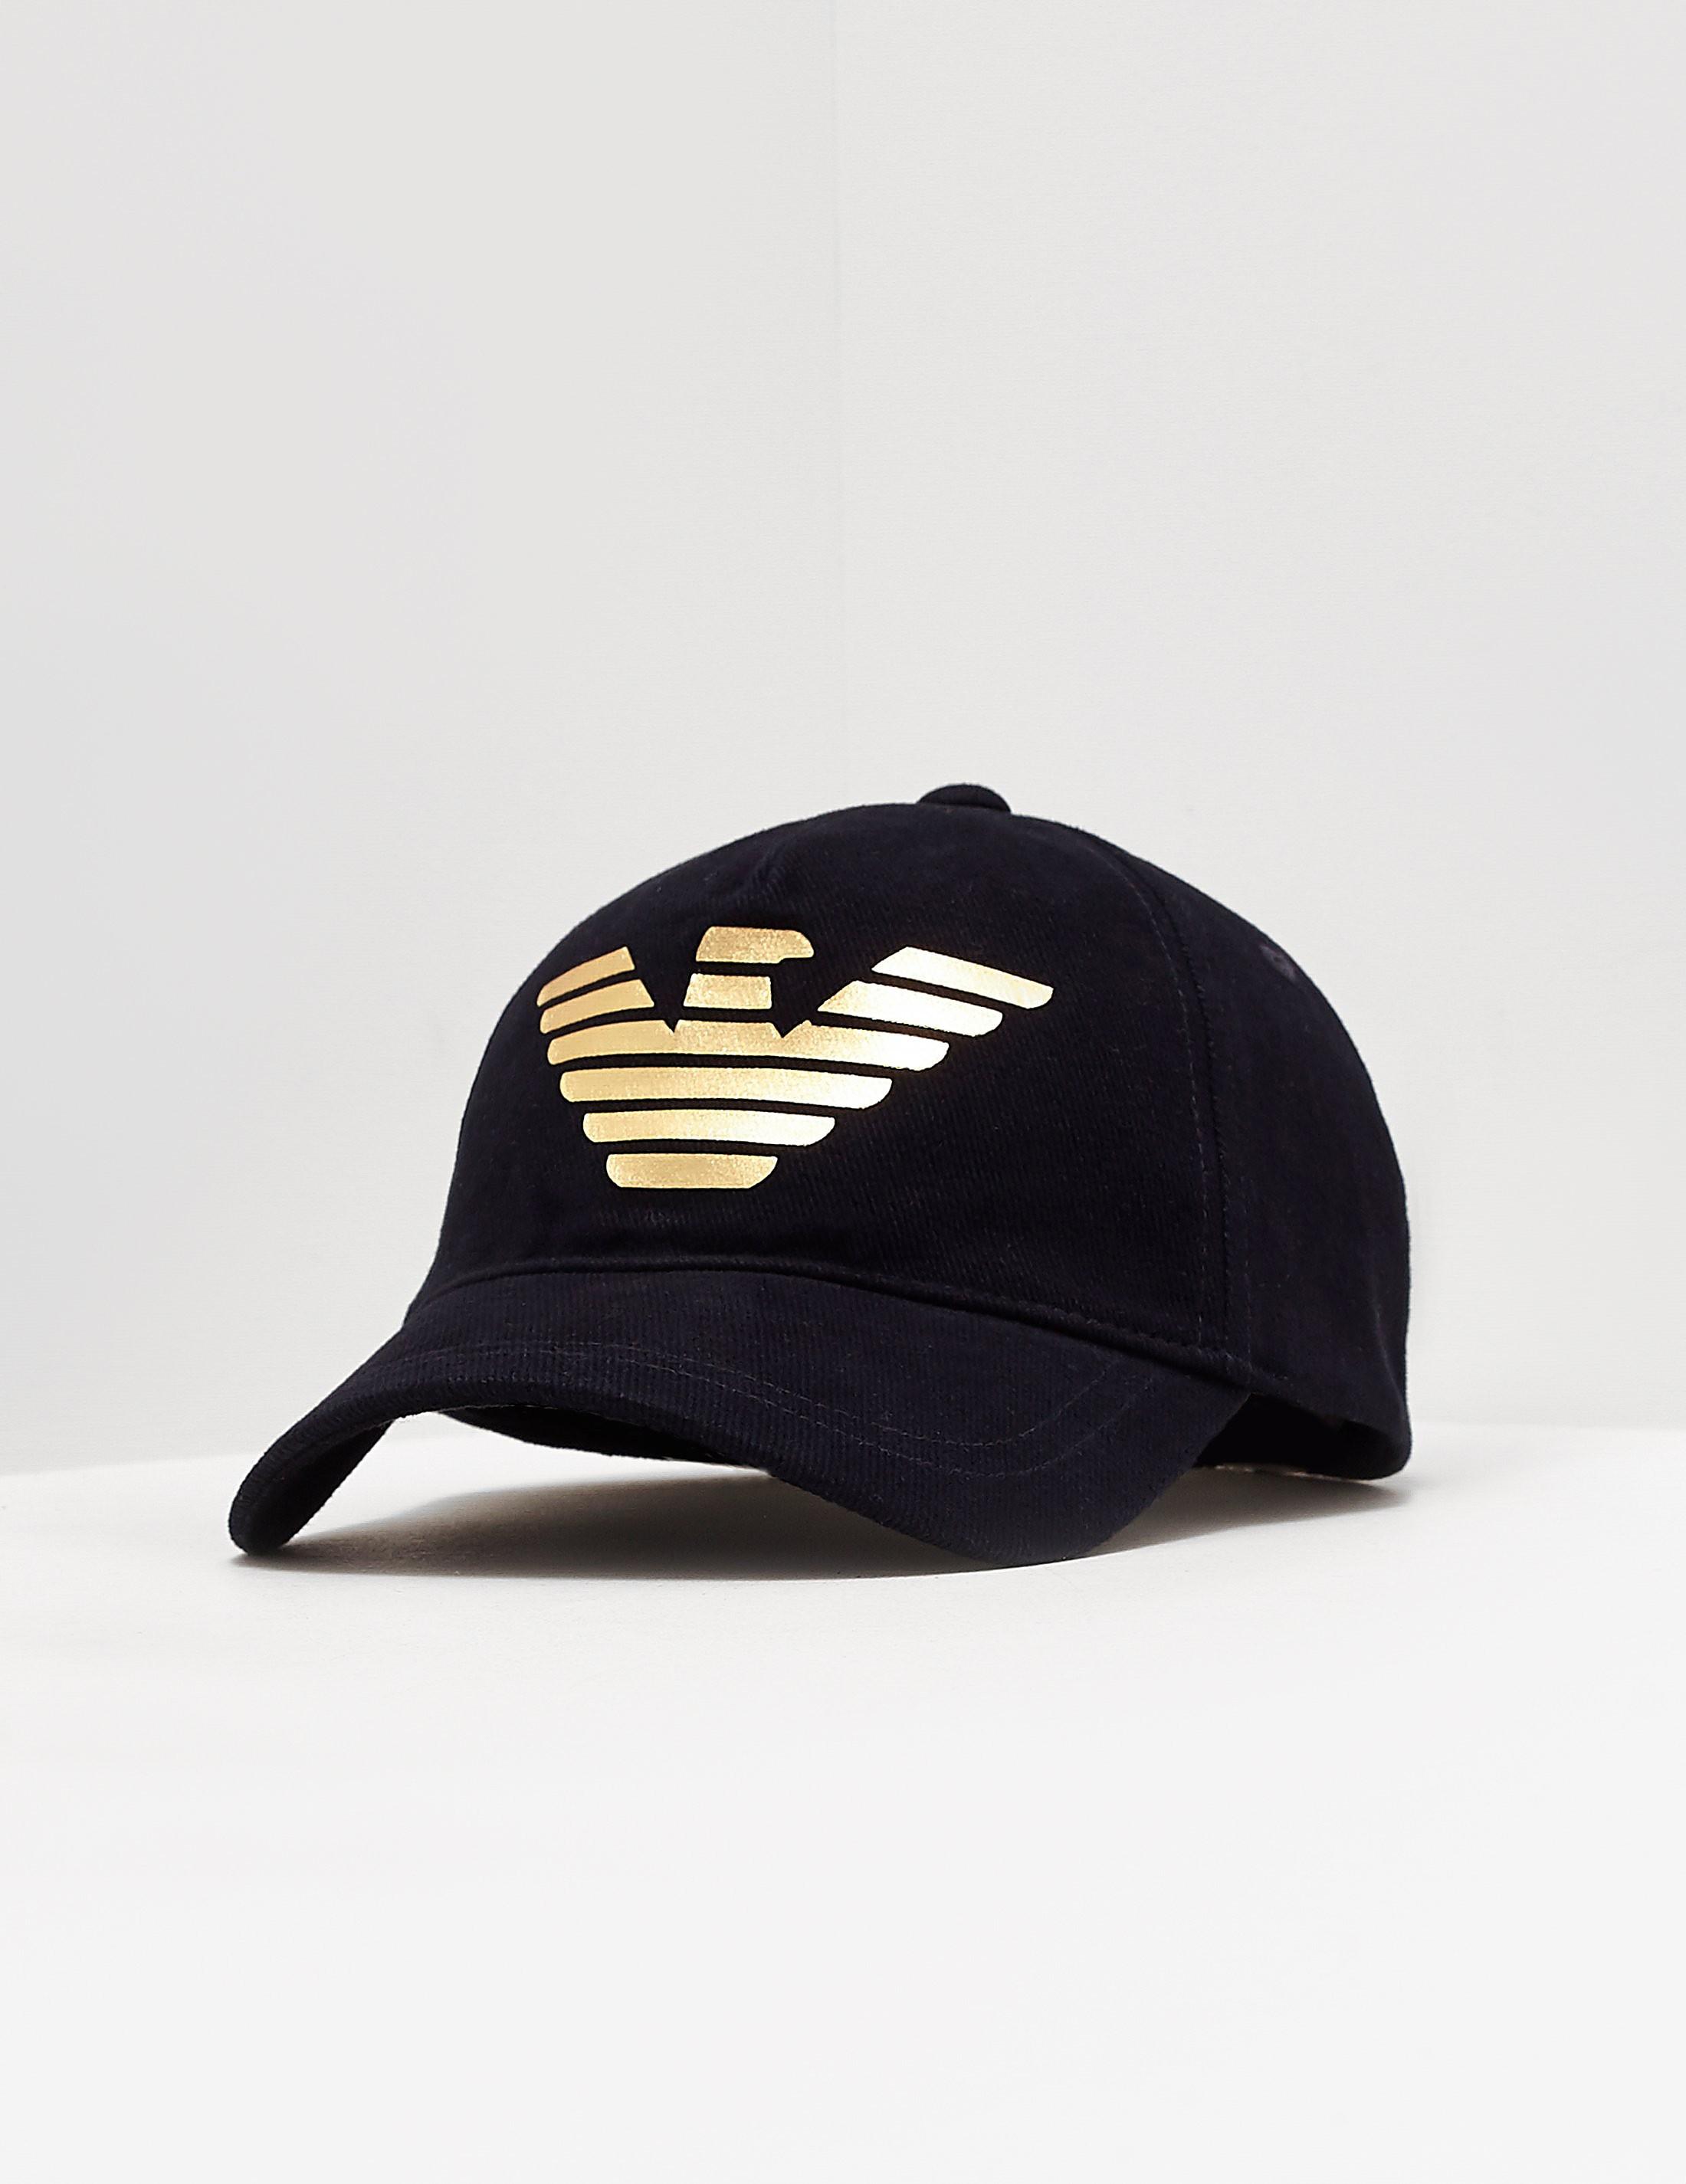 3a5640e1c2f Mens Emporio Armani Foil Eagle Cap Navy blue